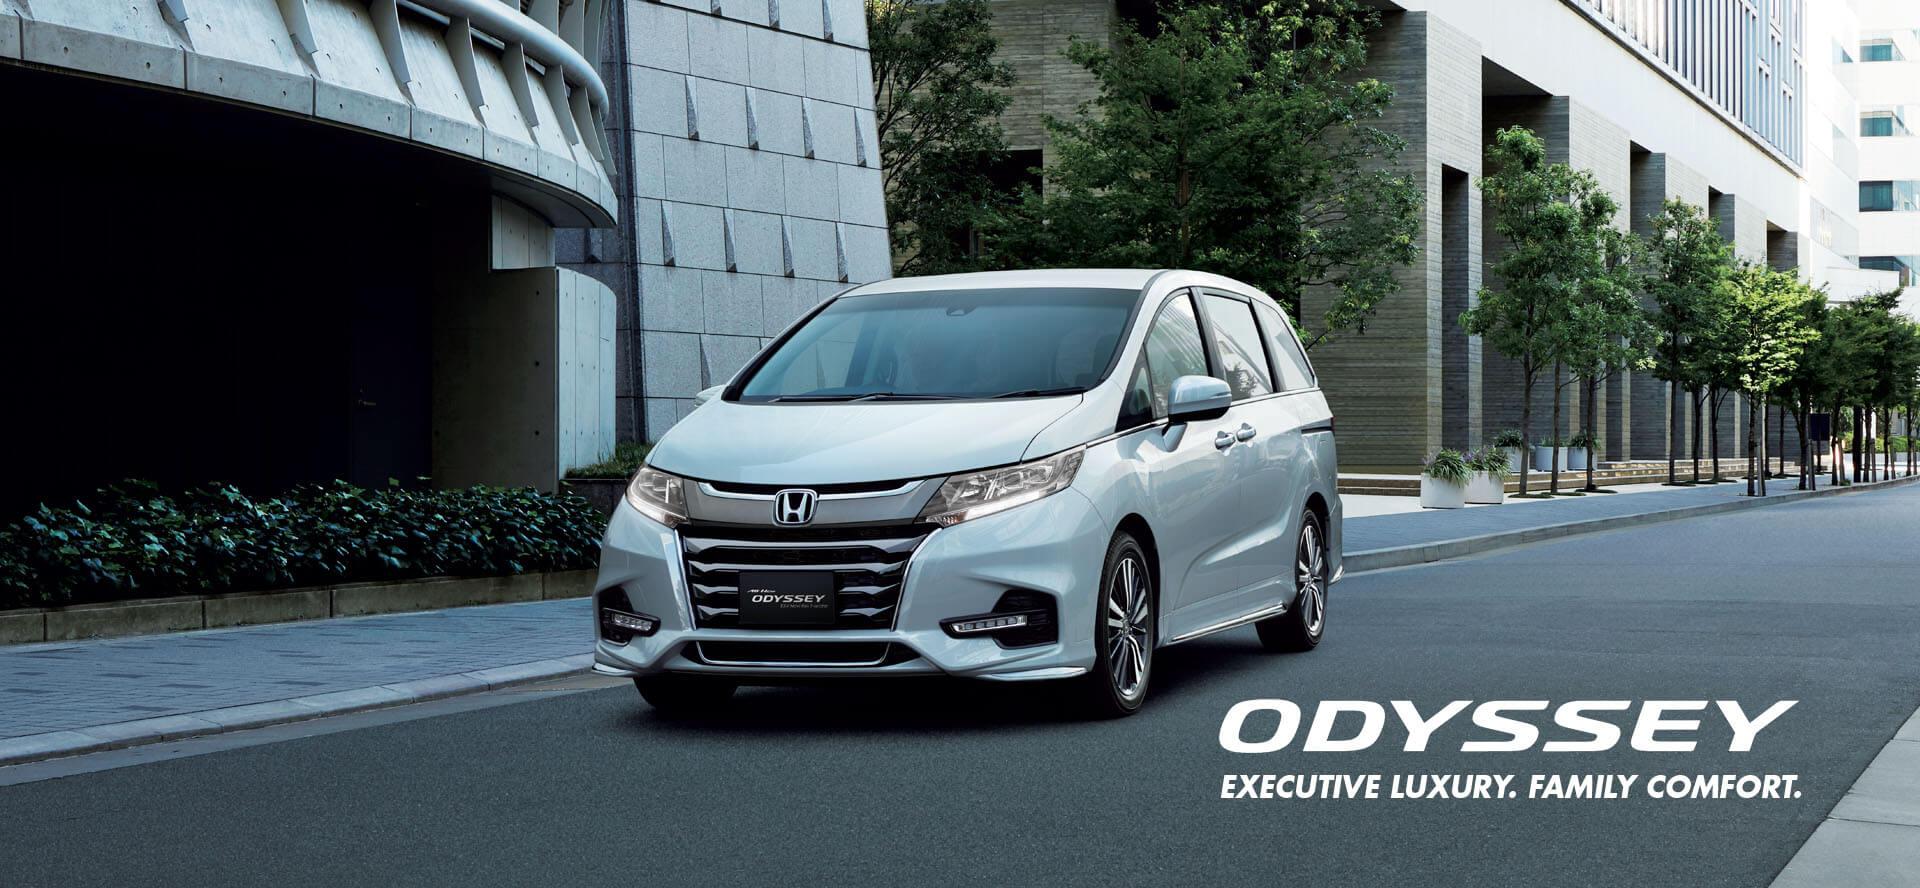 The All New Honda Odyssey - Executive Luxury, Family Comfort